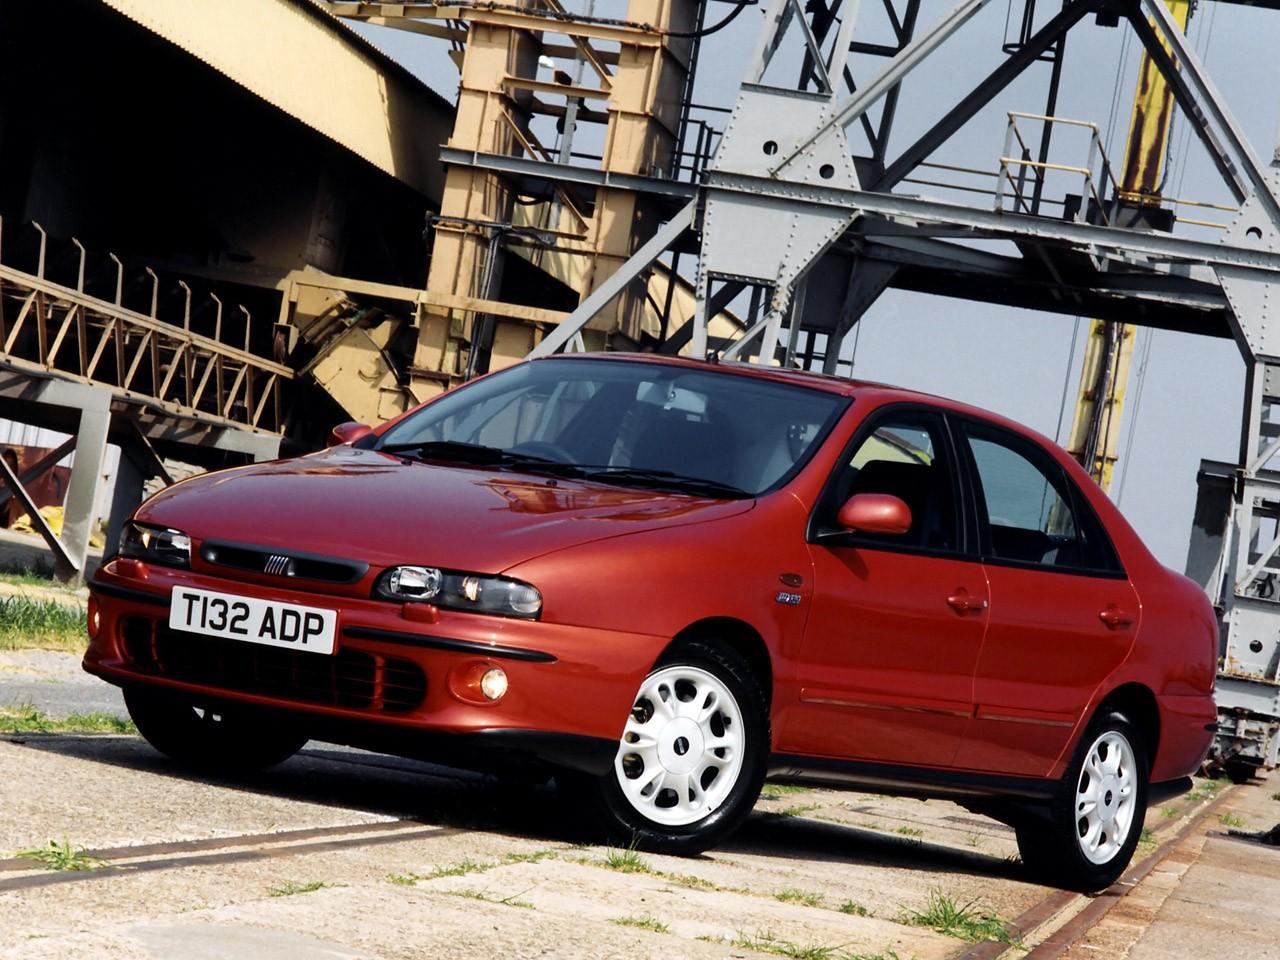 1996 Fiat Marea uk